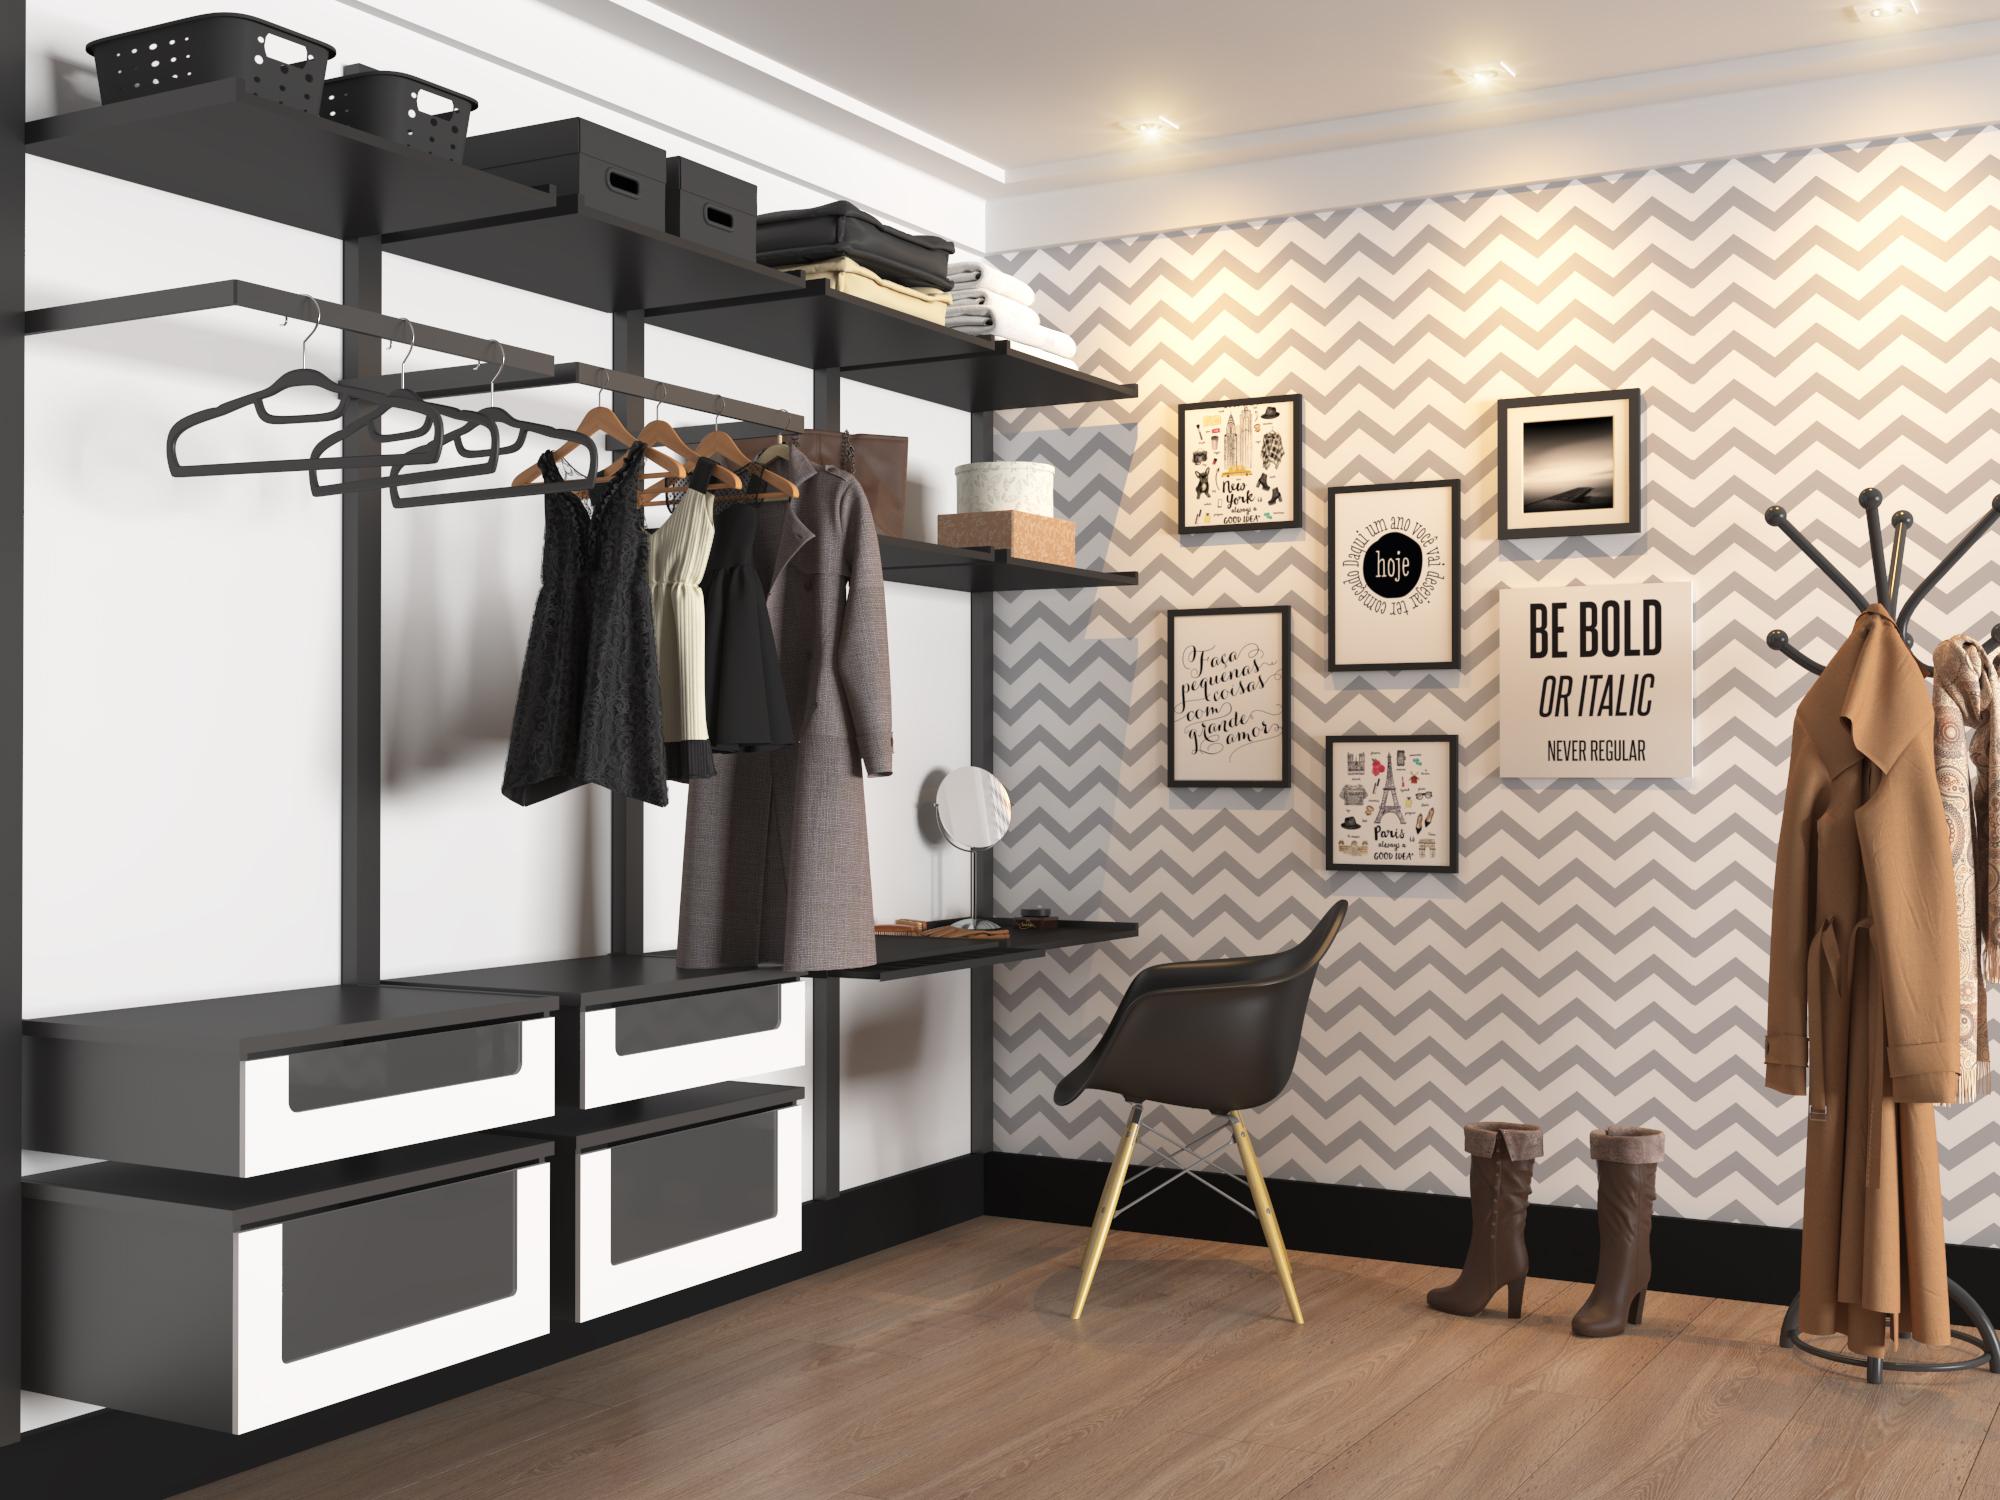 Closet grande com papel de parede leroy merlin for Closet grandes y baratos